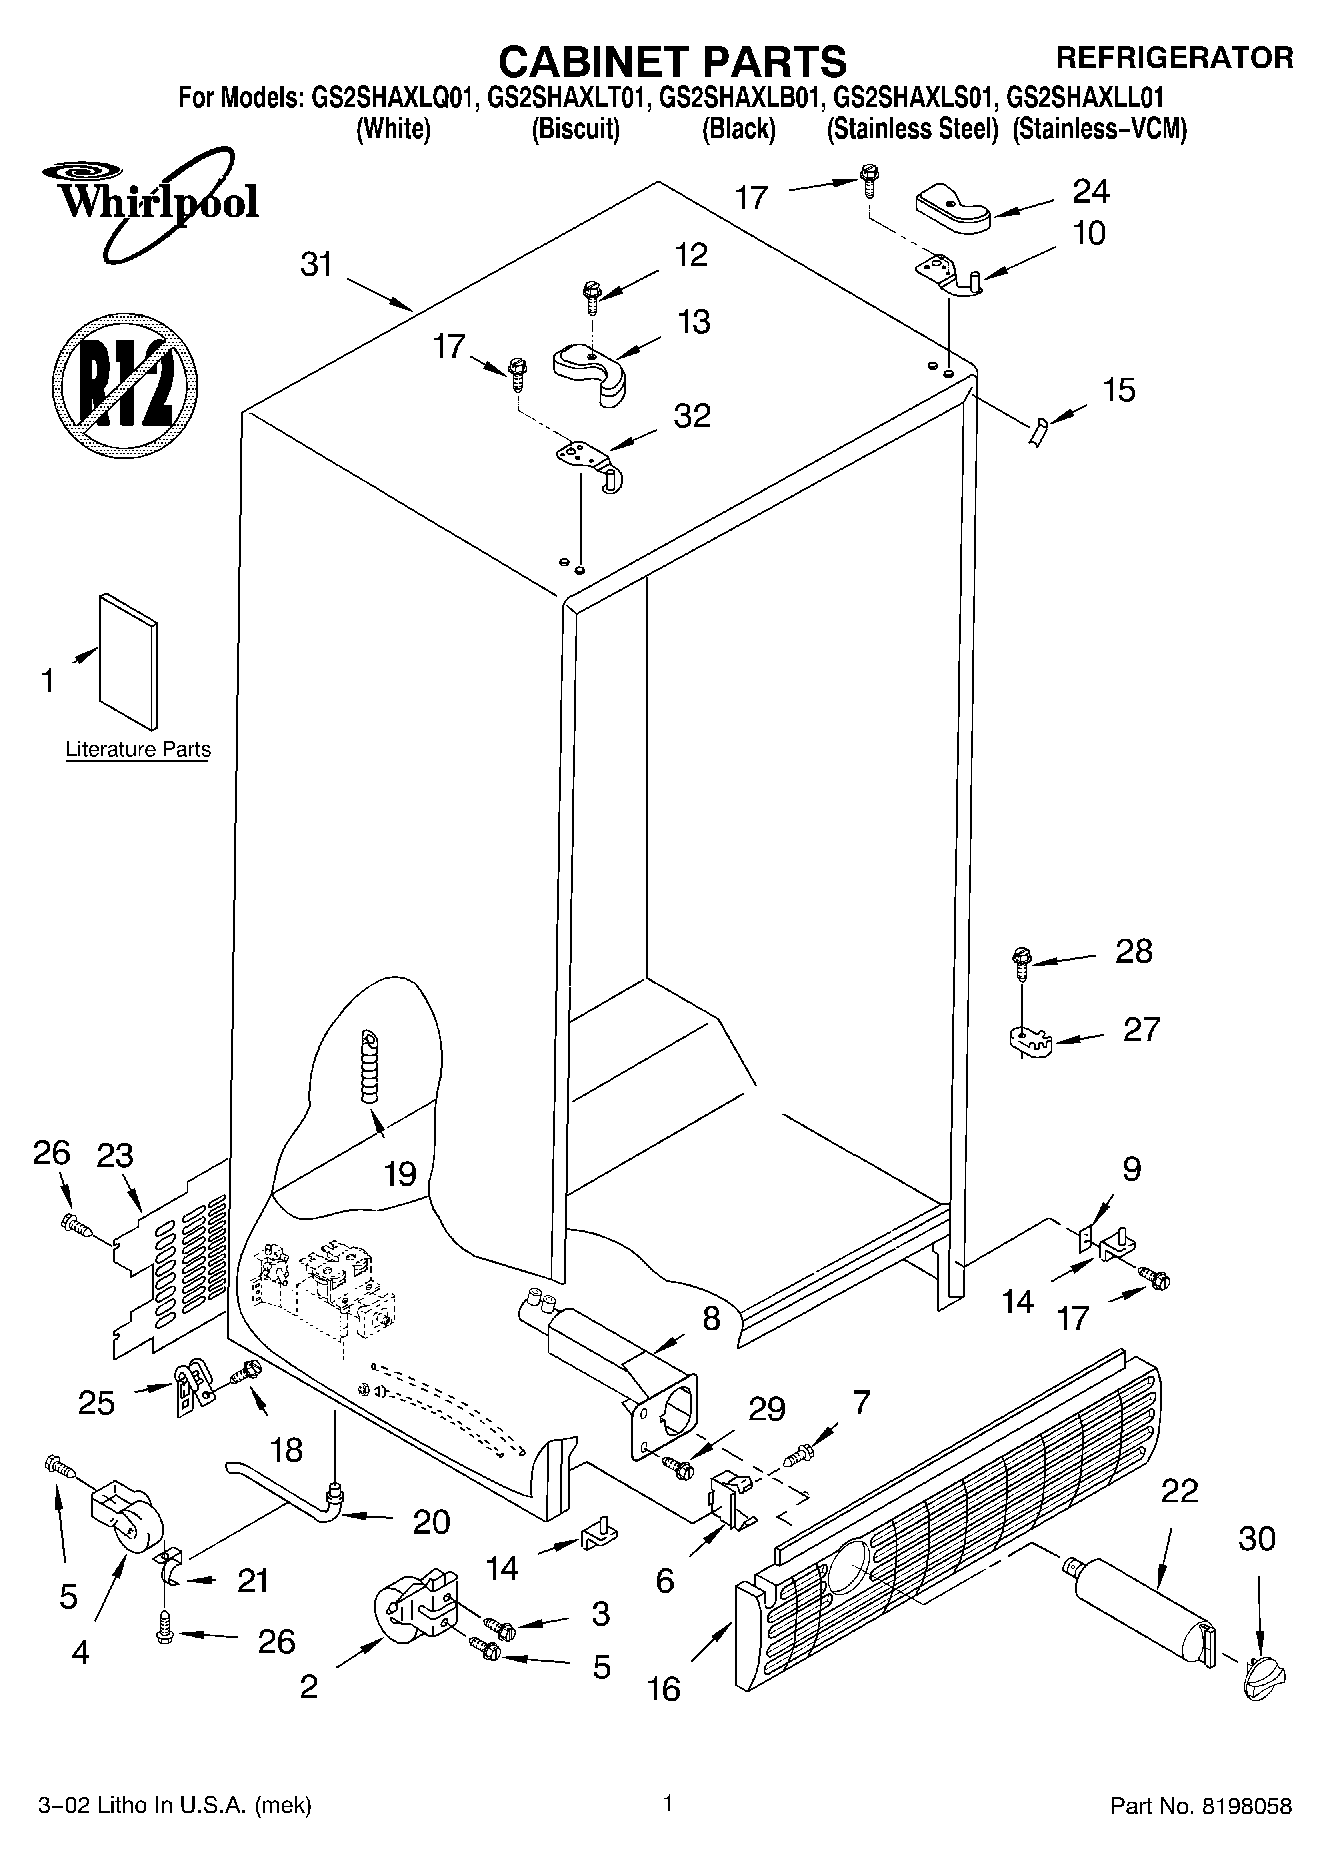 GS2SHAXLB01